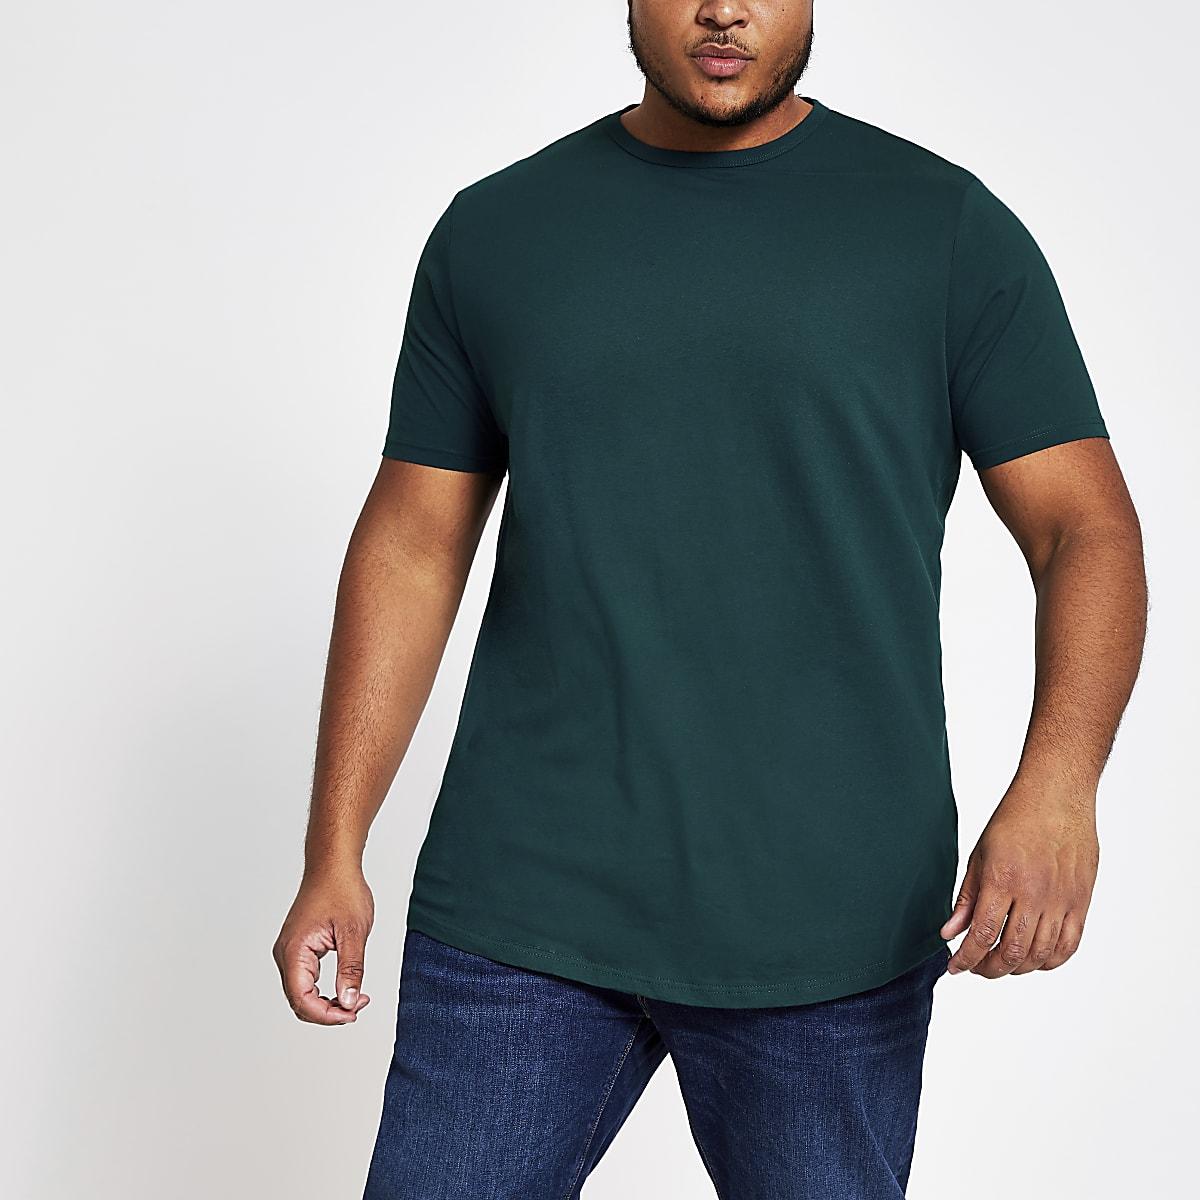 Big and Tall teal curve hem T-shirt